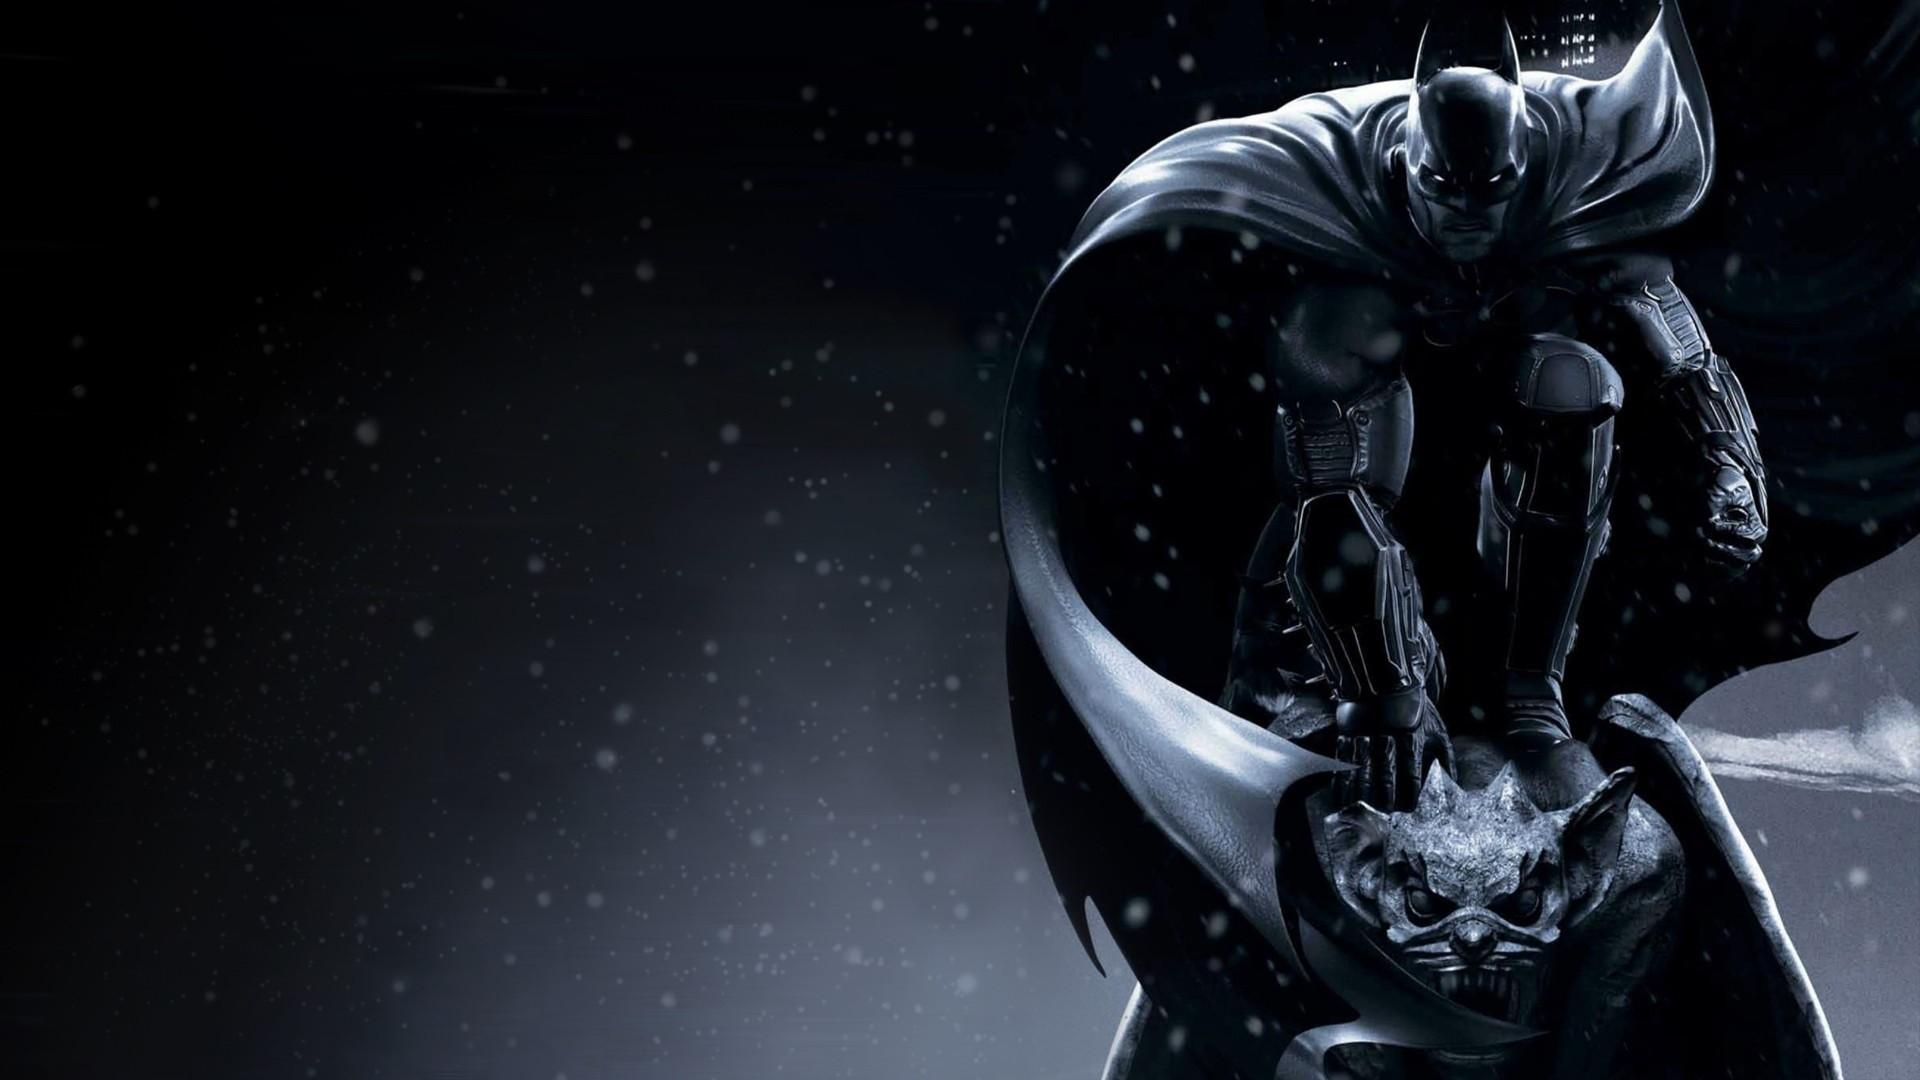 Batman Arkham Origins desktop wallpaper | WallpaperPixel